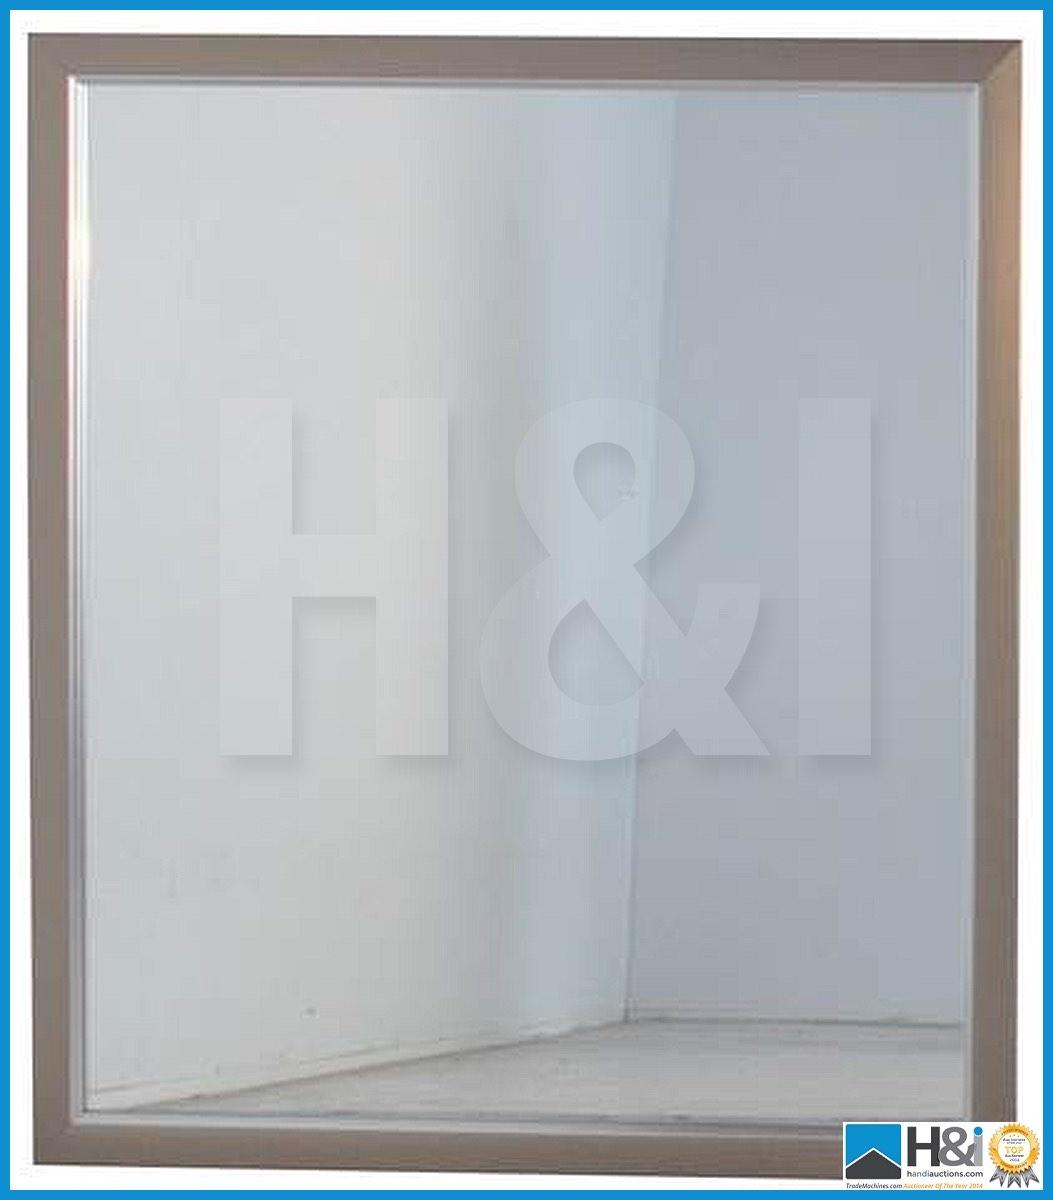 Lot 24 - Stunning black walnut bedroom furniture set comprising: 2-door wardrobe - H 193cm x W 110cm